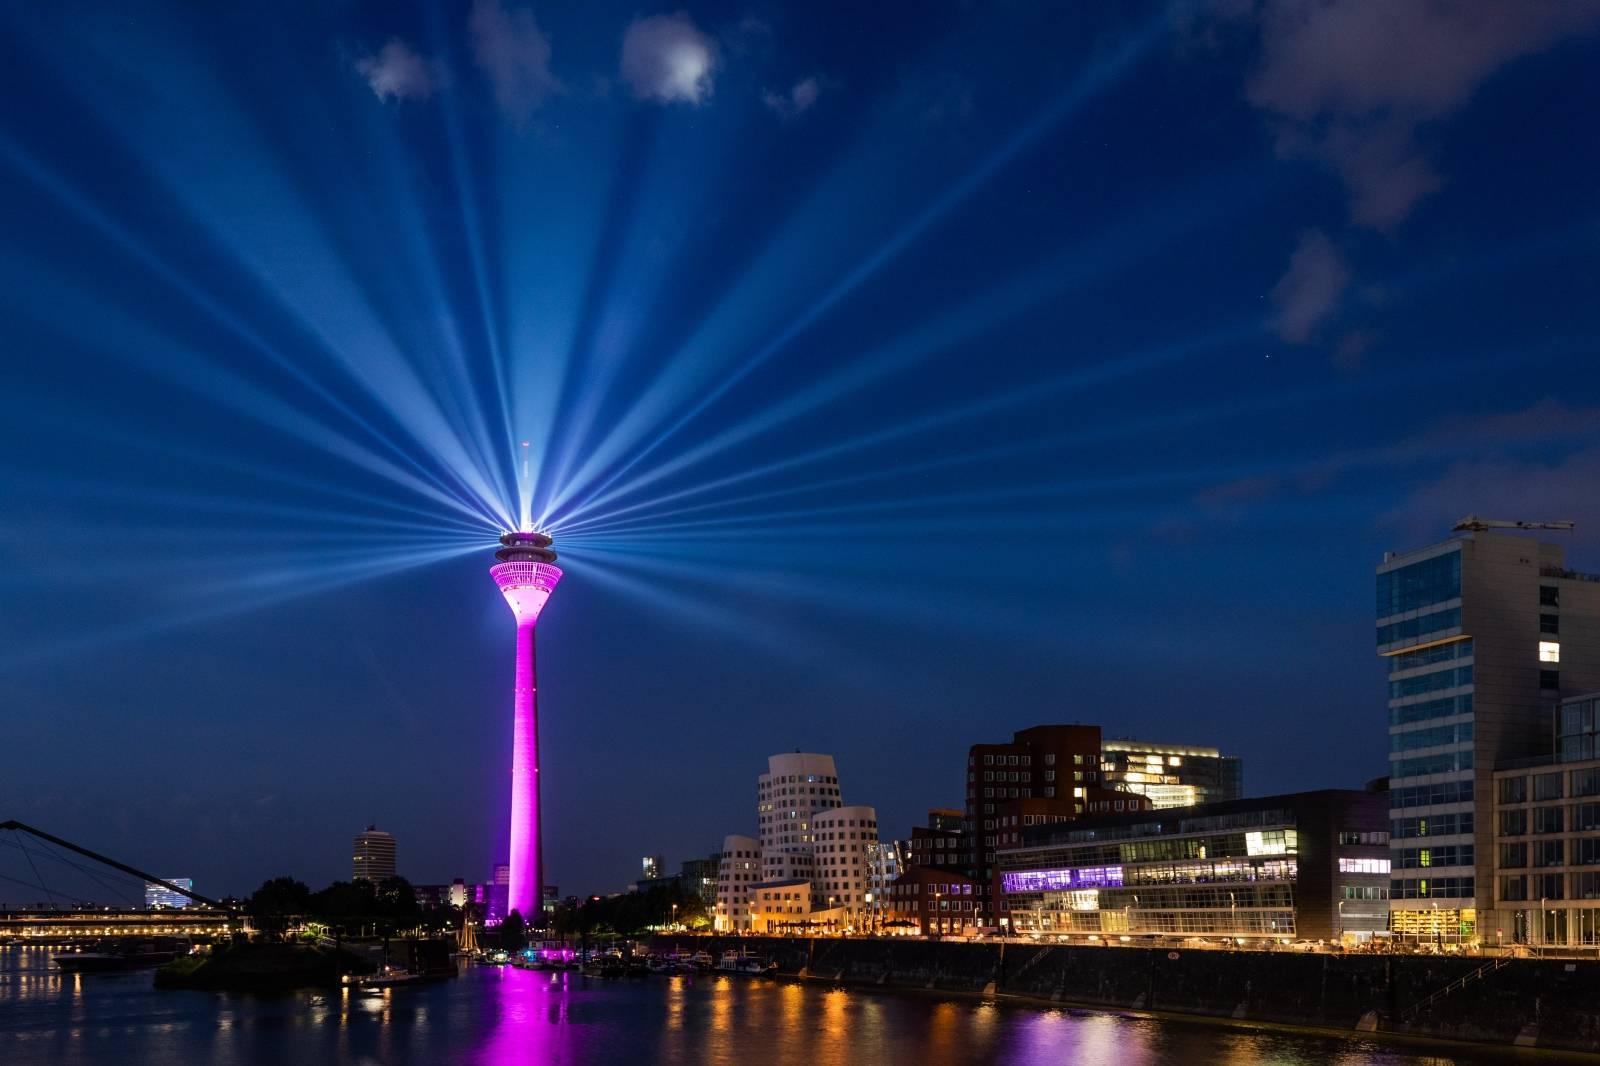 Light show at the Düsseldorf Rhine Tower